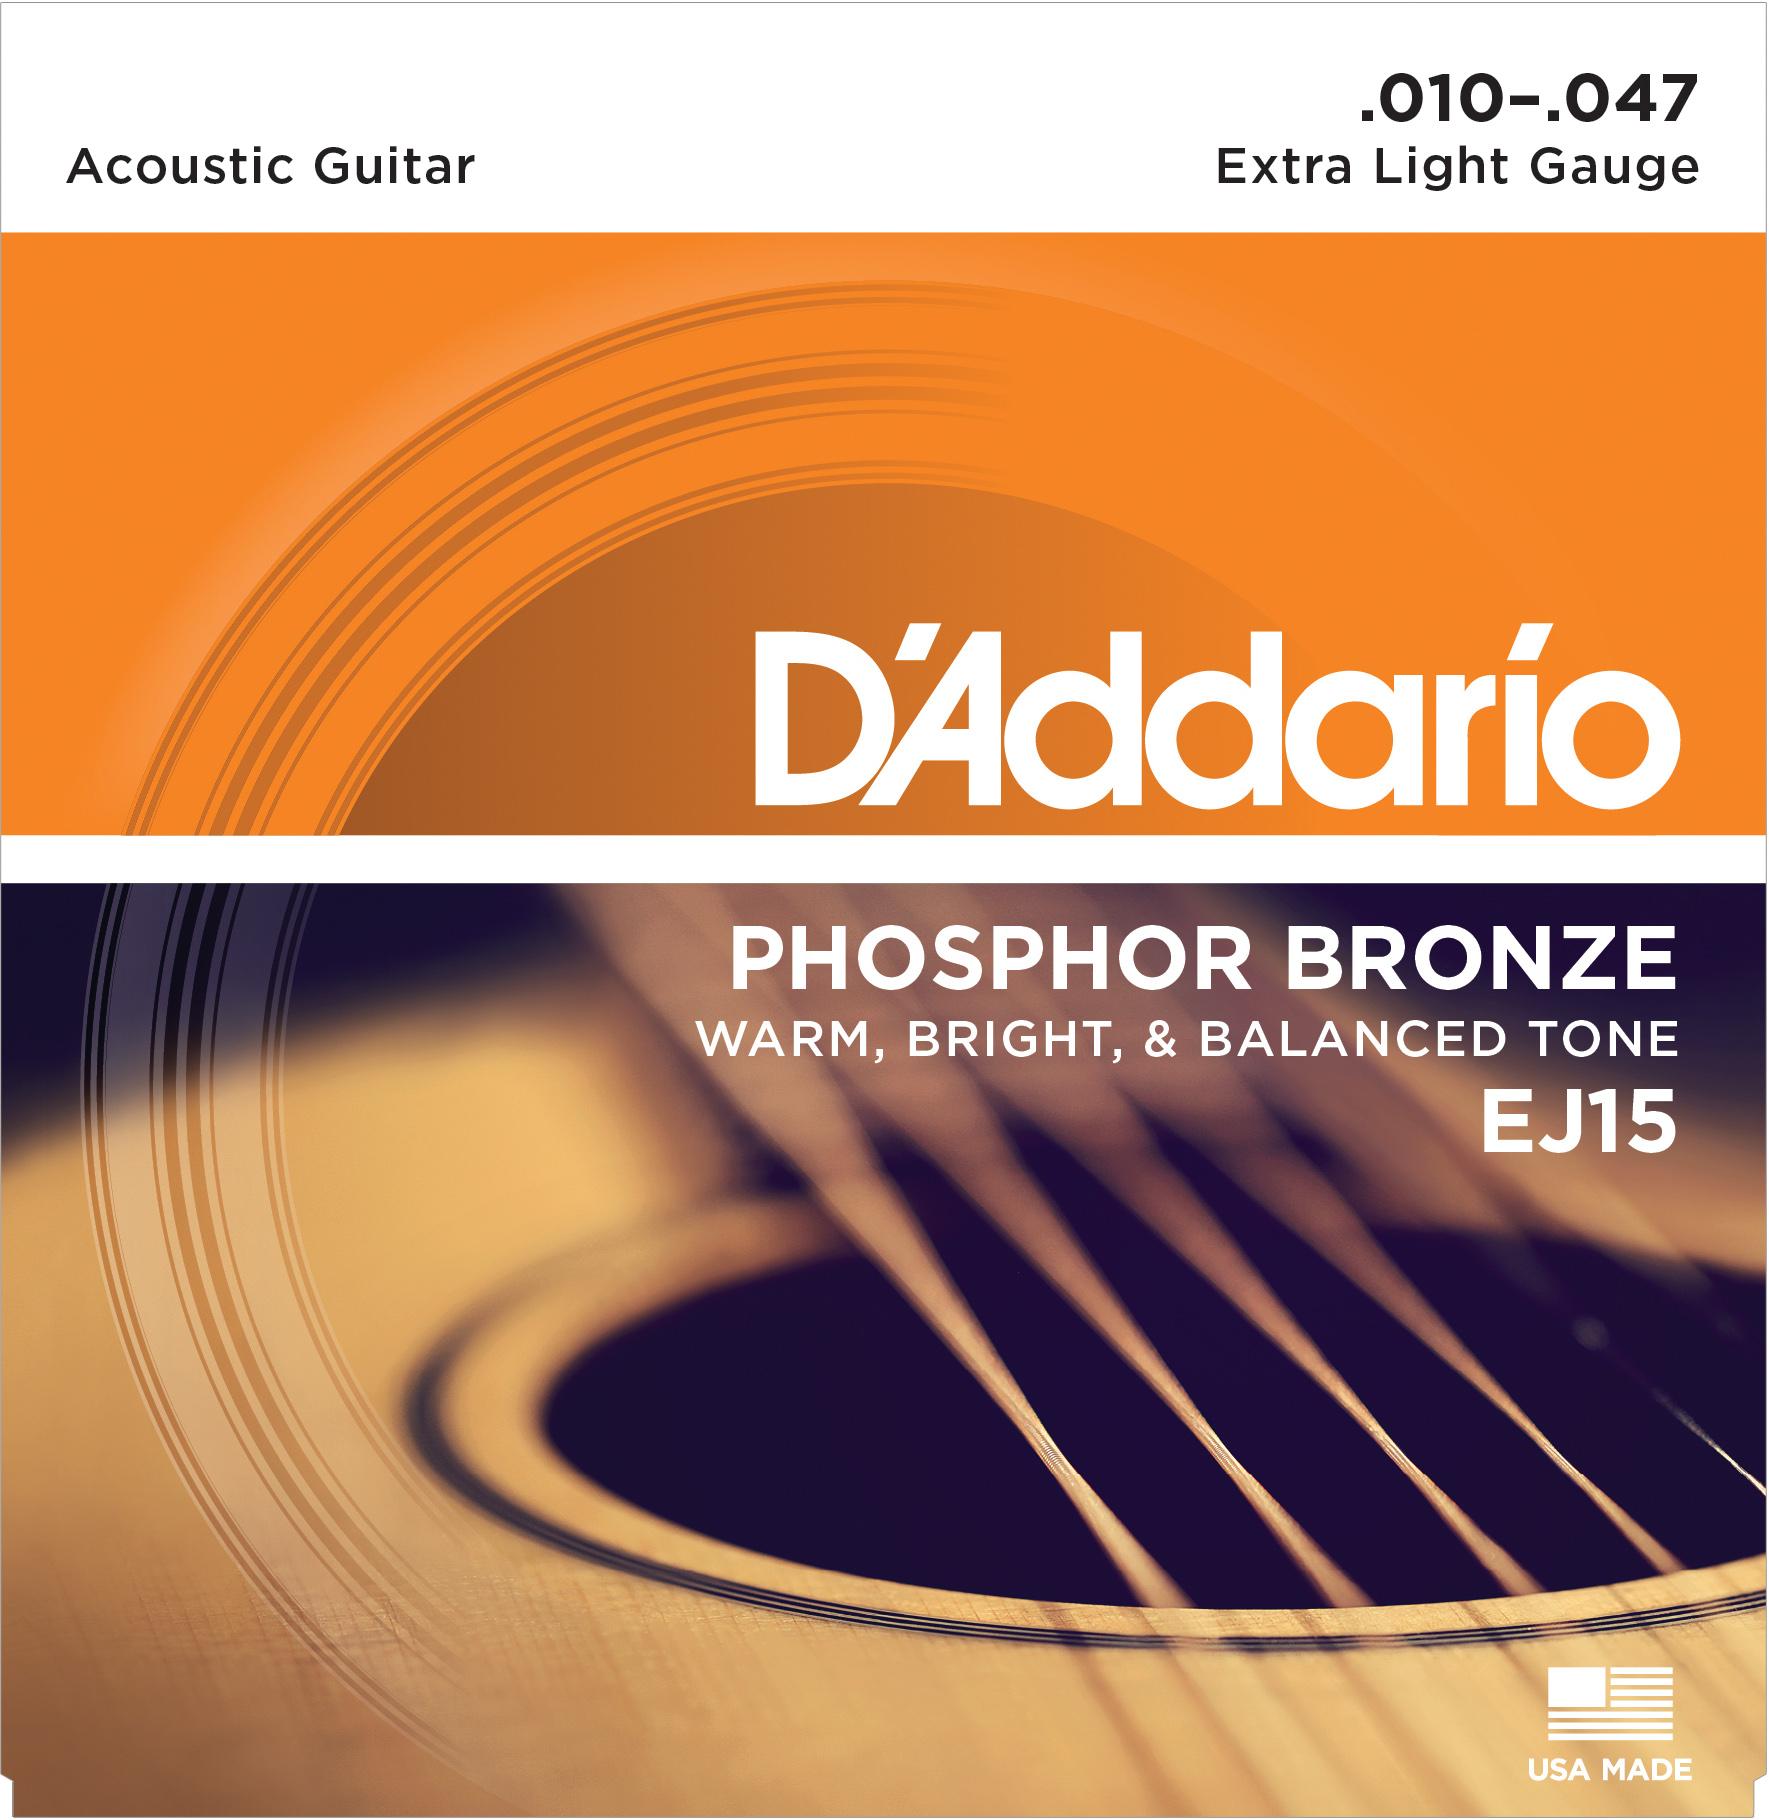 D'Addario EJ15 Набор 6 струн для гитары акустик фосфор-бронза 010-047